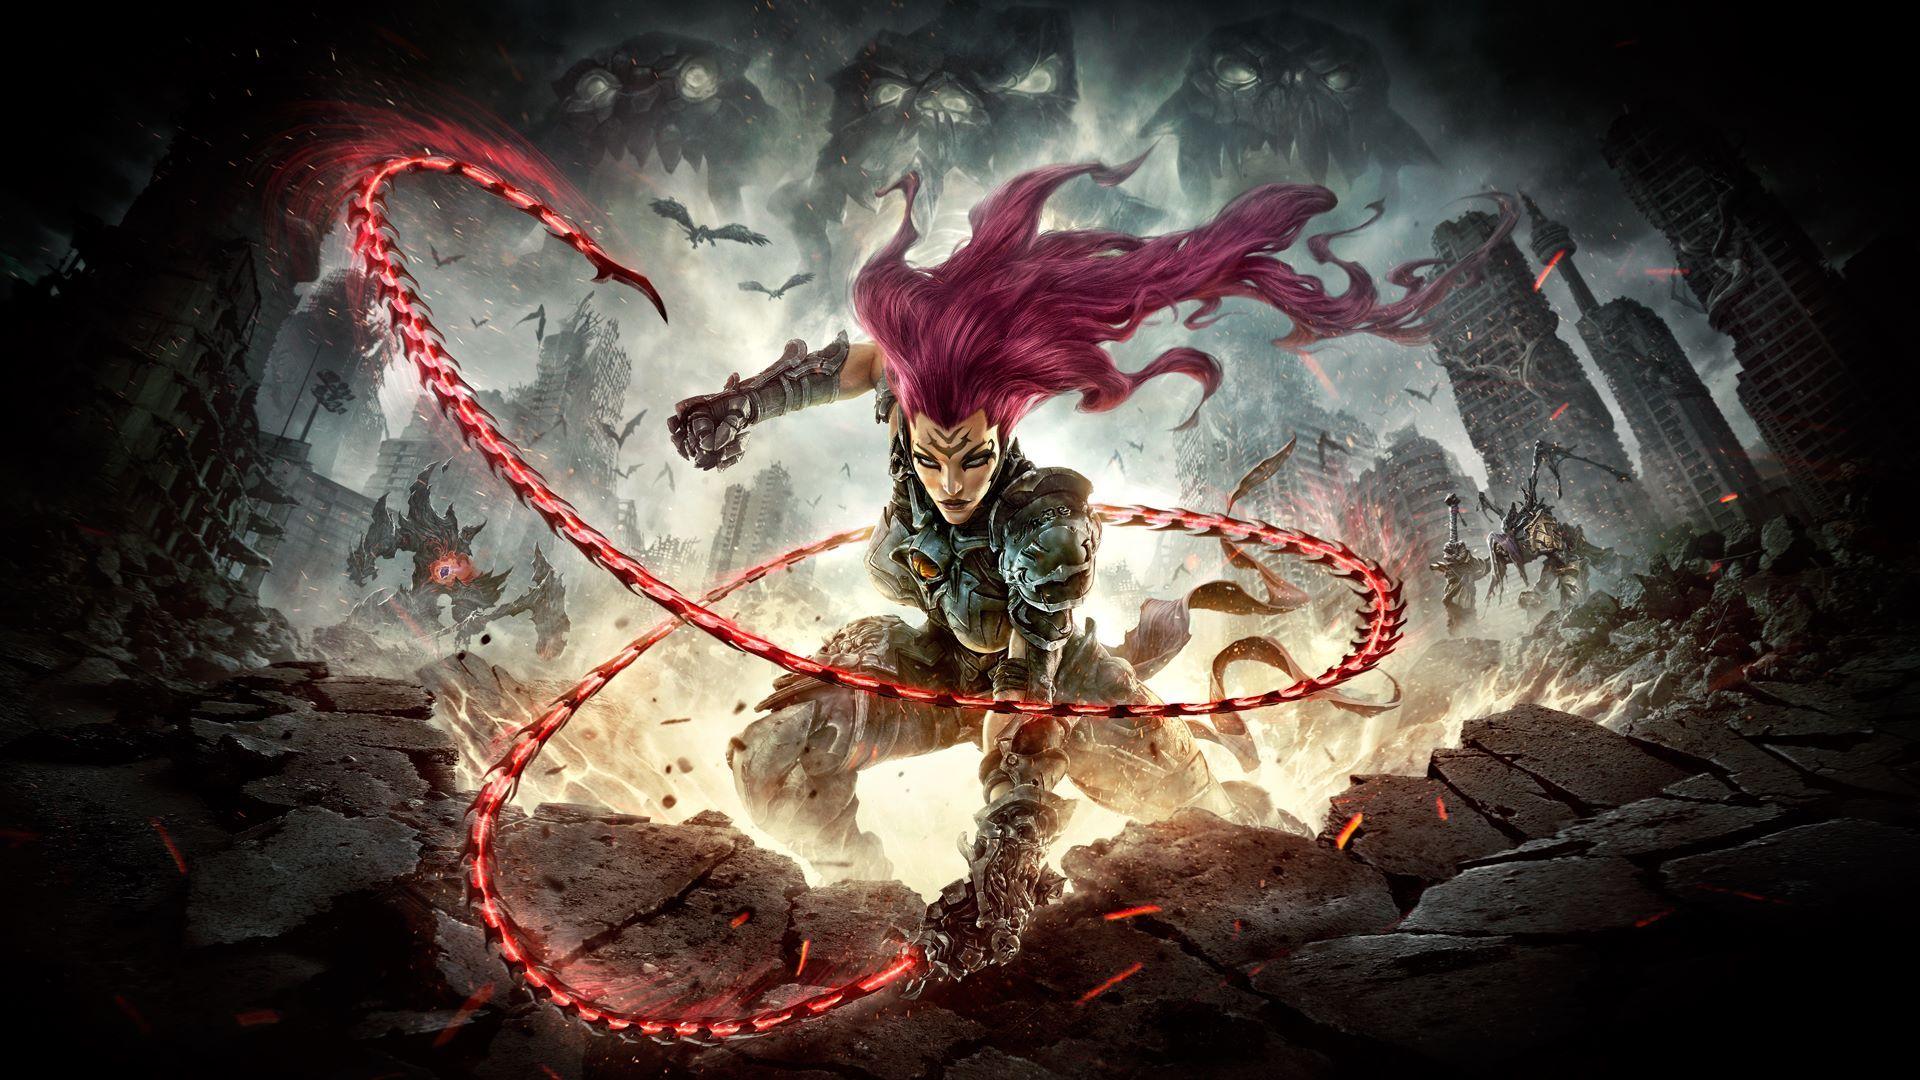 سی دی کی اریجینال استیم بازی Darksiders III